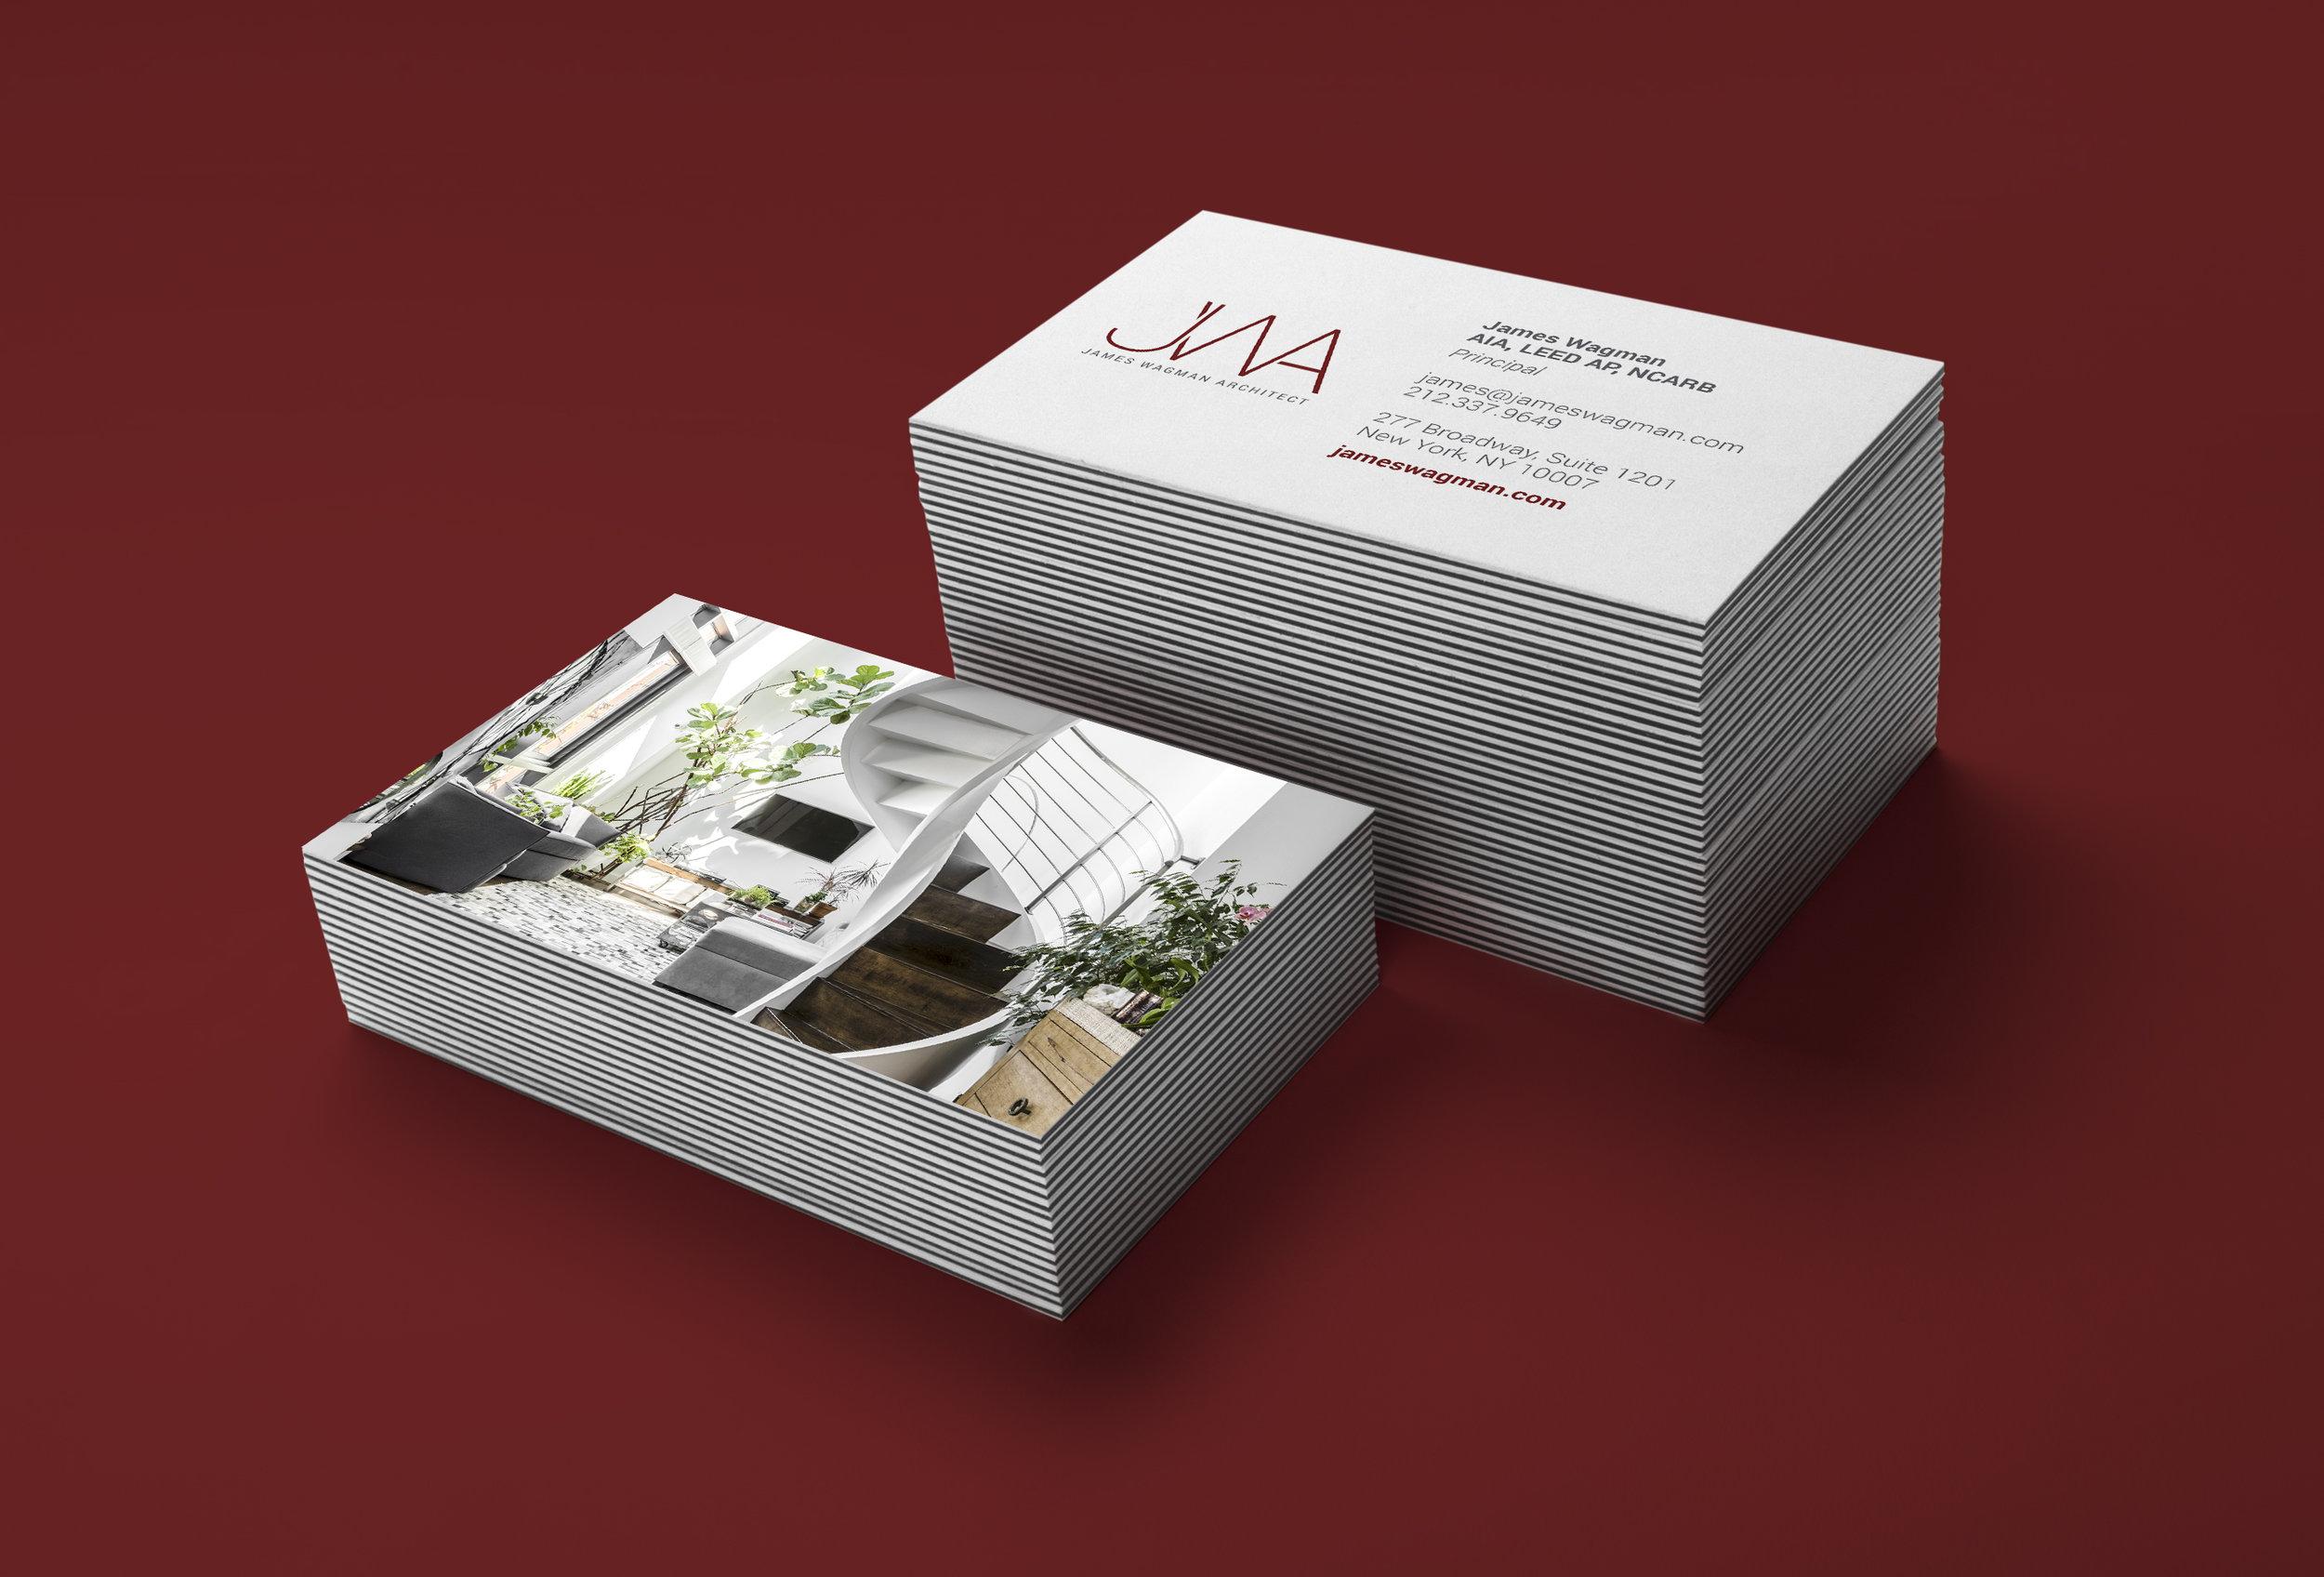 JWA_Business_Card_2.jpg